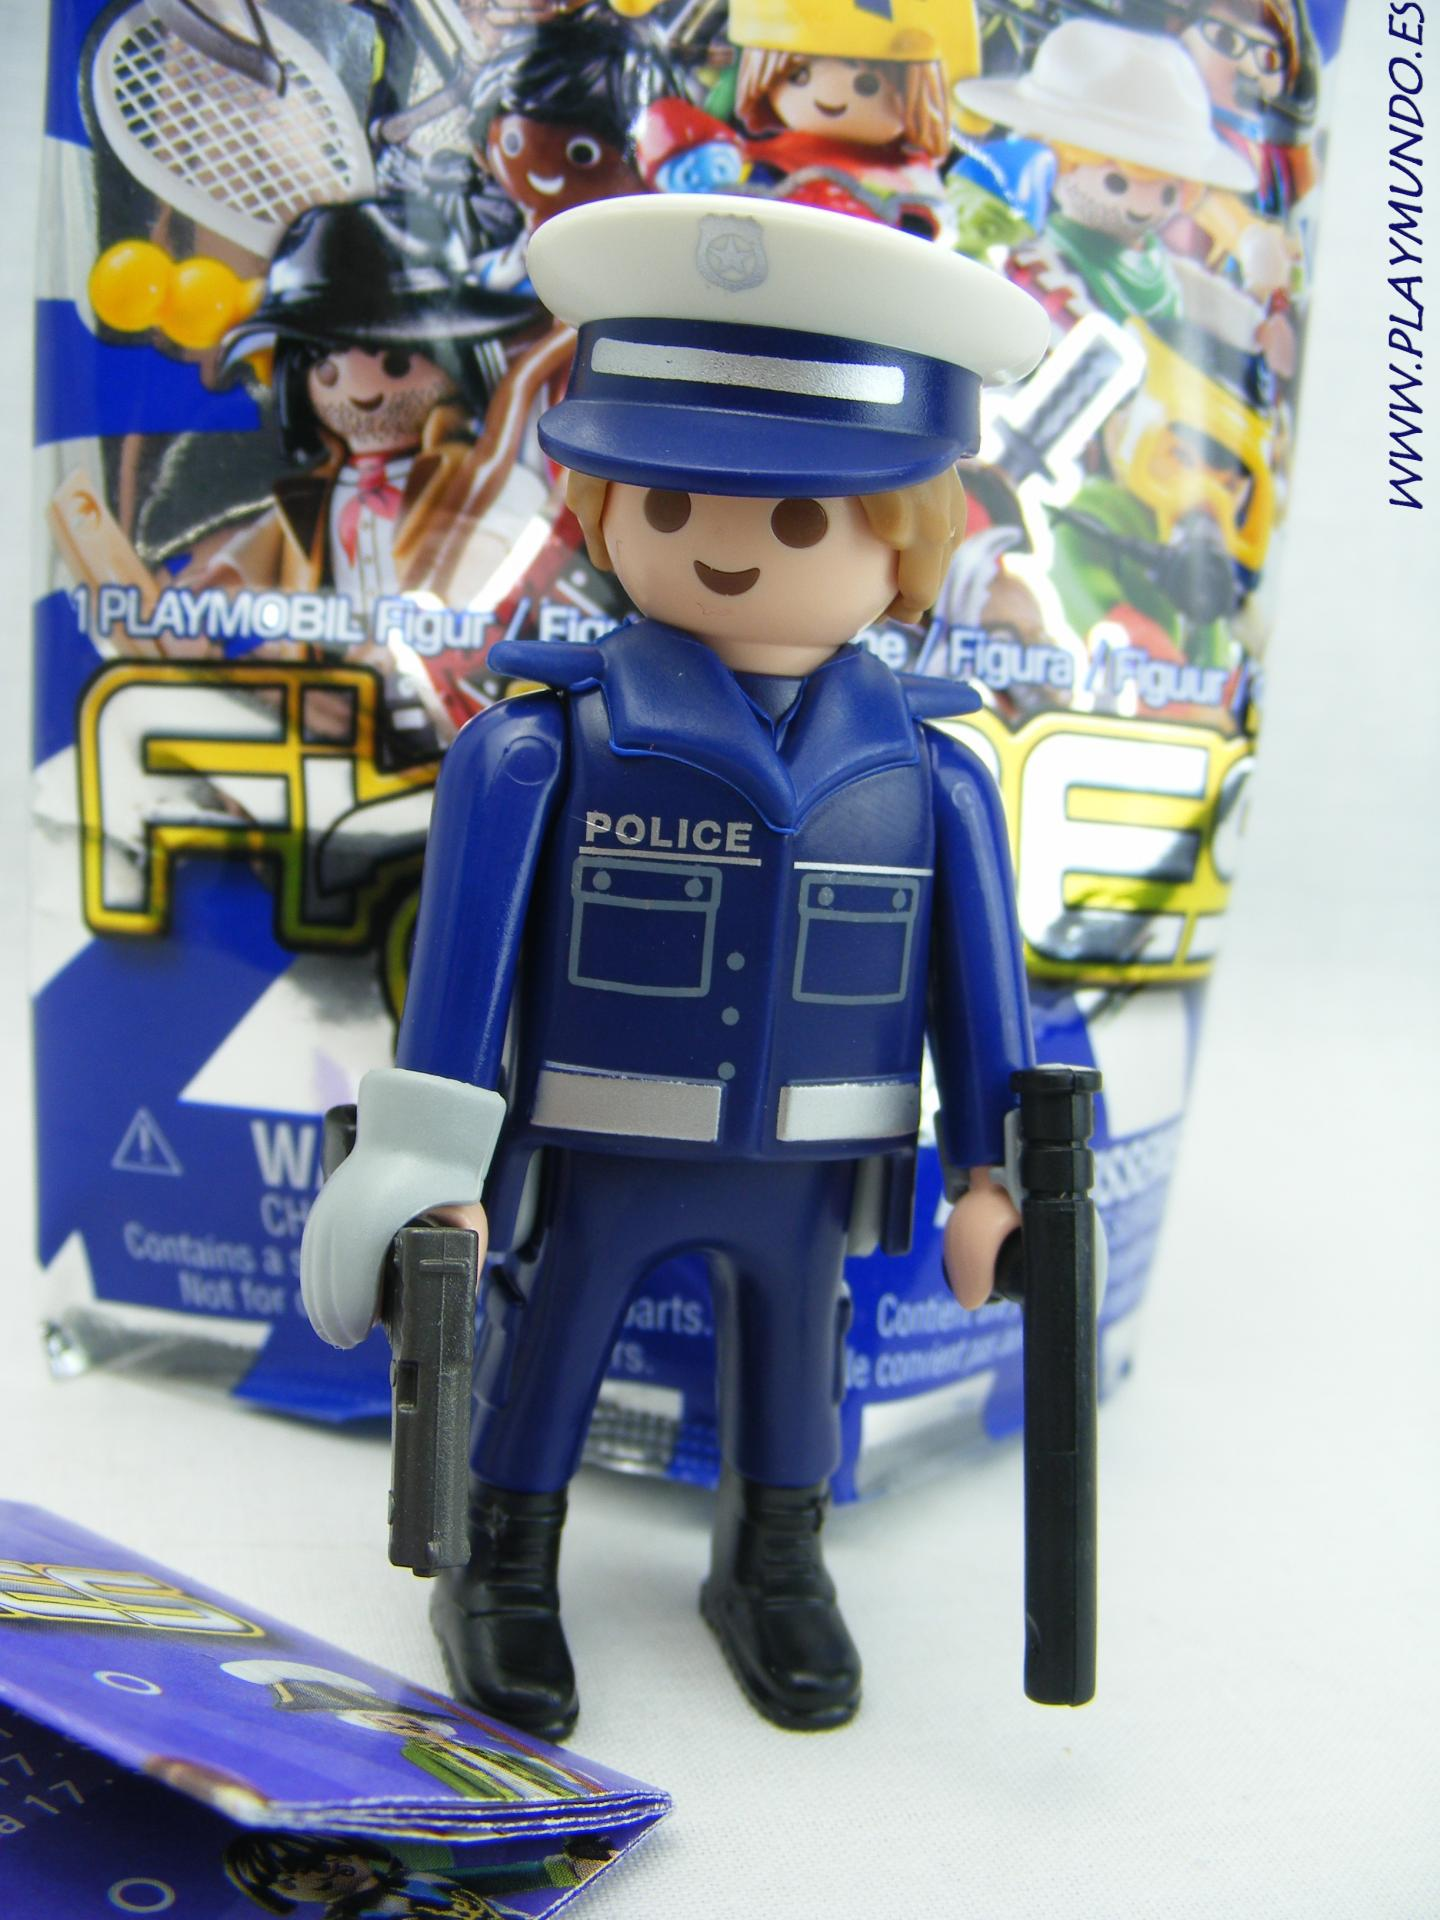 PLAYMOBIL SERIE 17 CHICOS POLICIA